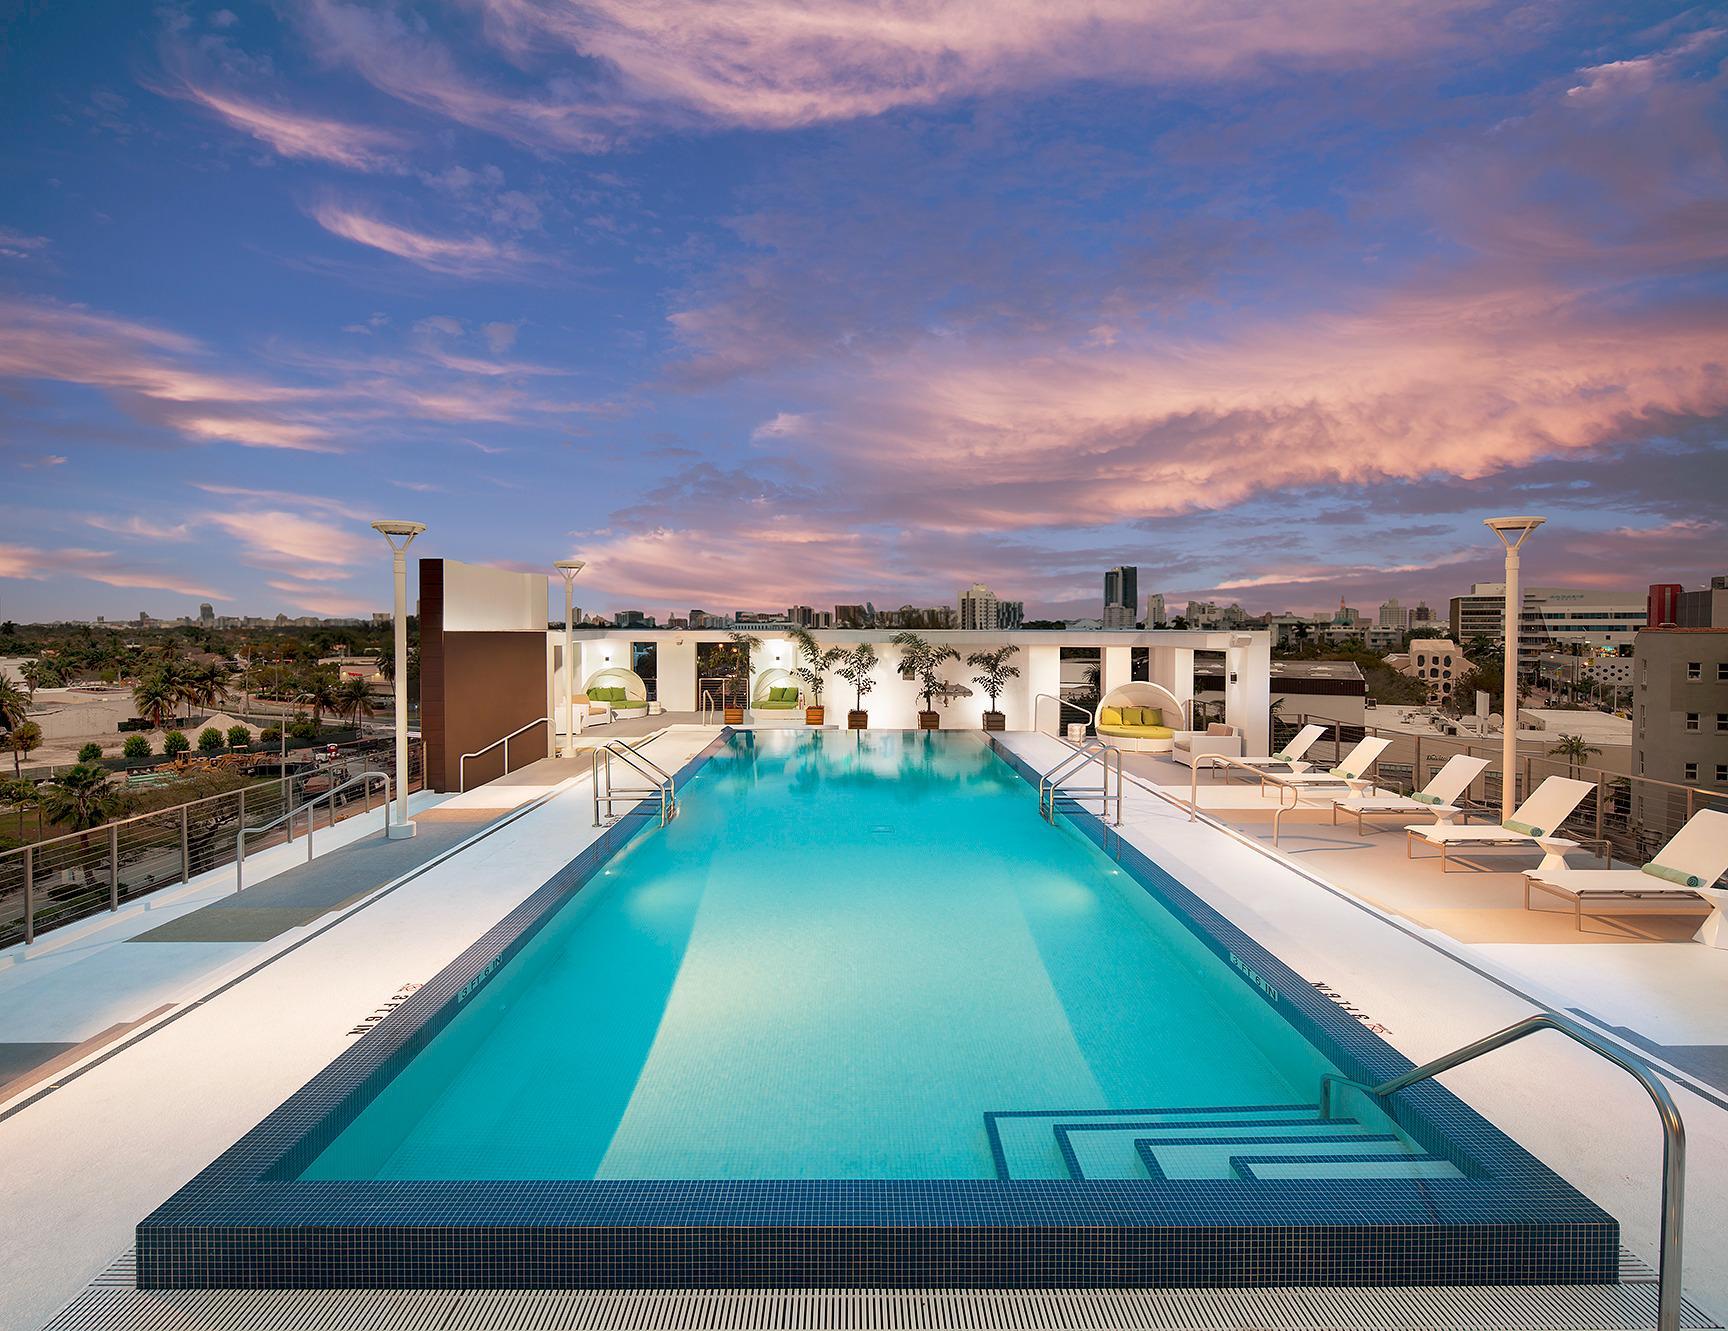 Pool Supplies Miami Beach